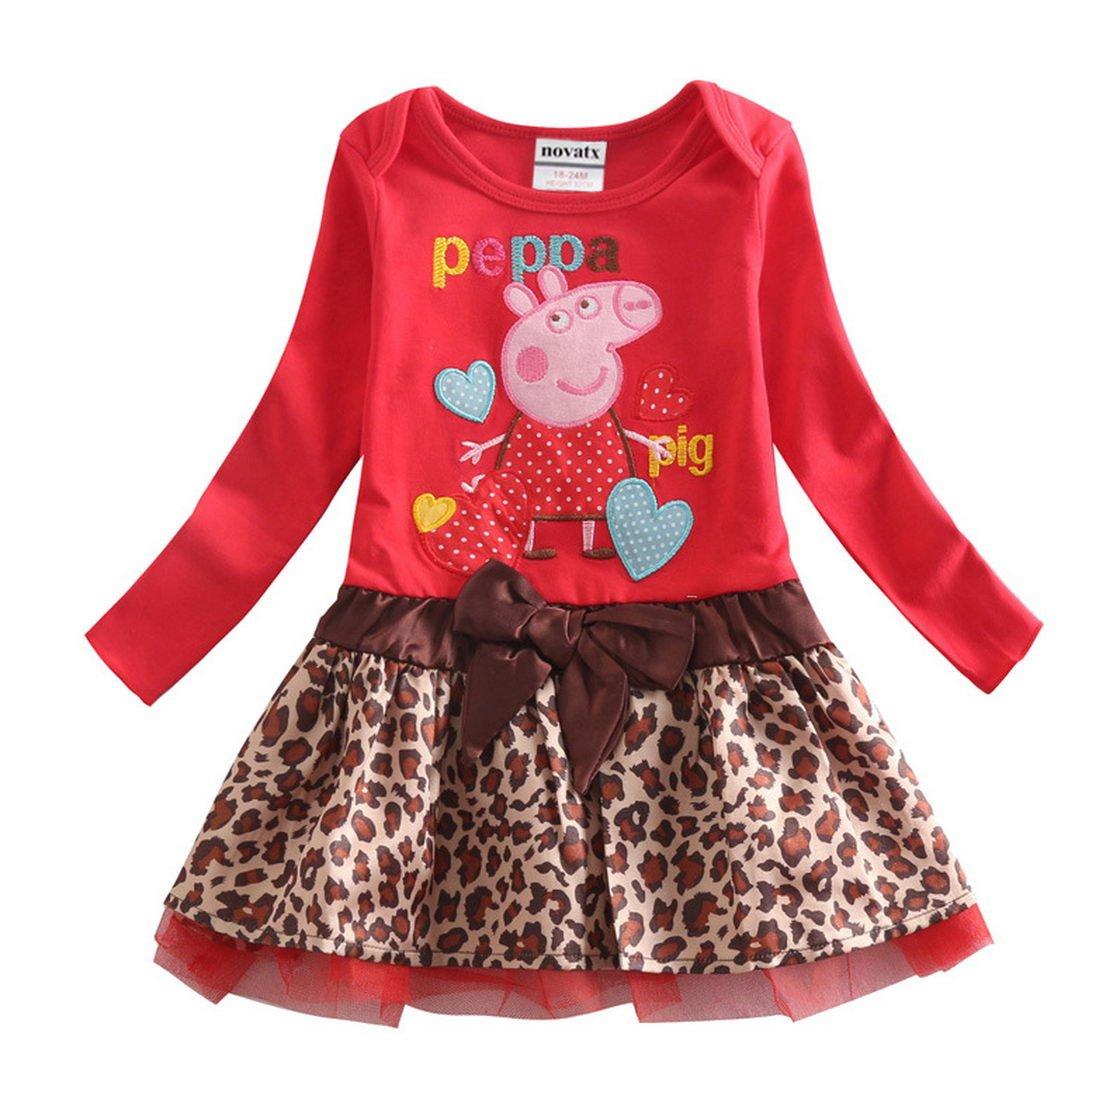 Peppa Pig Little Girls Long Sleeve Cartoon Stitching Cotton Flounced Dress 1-6Y Tiful